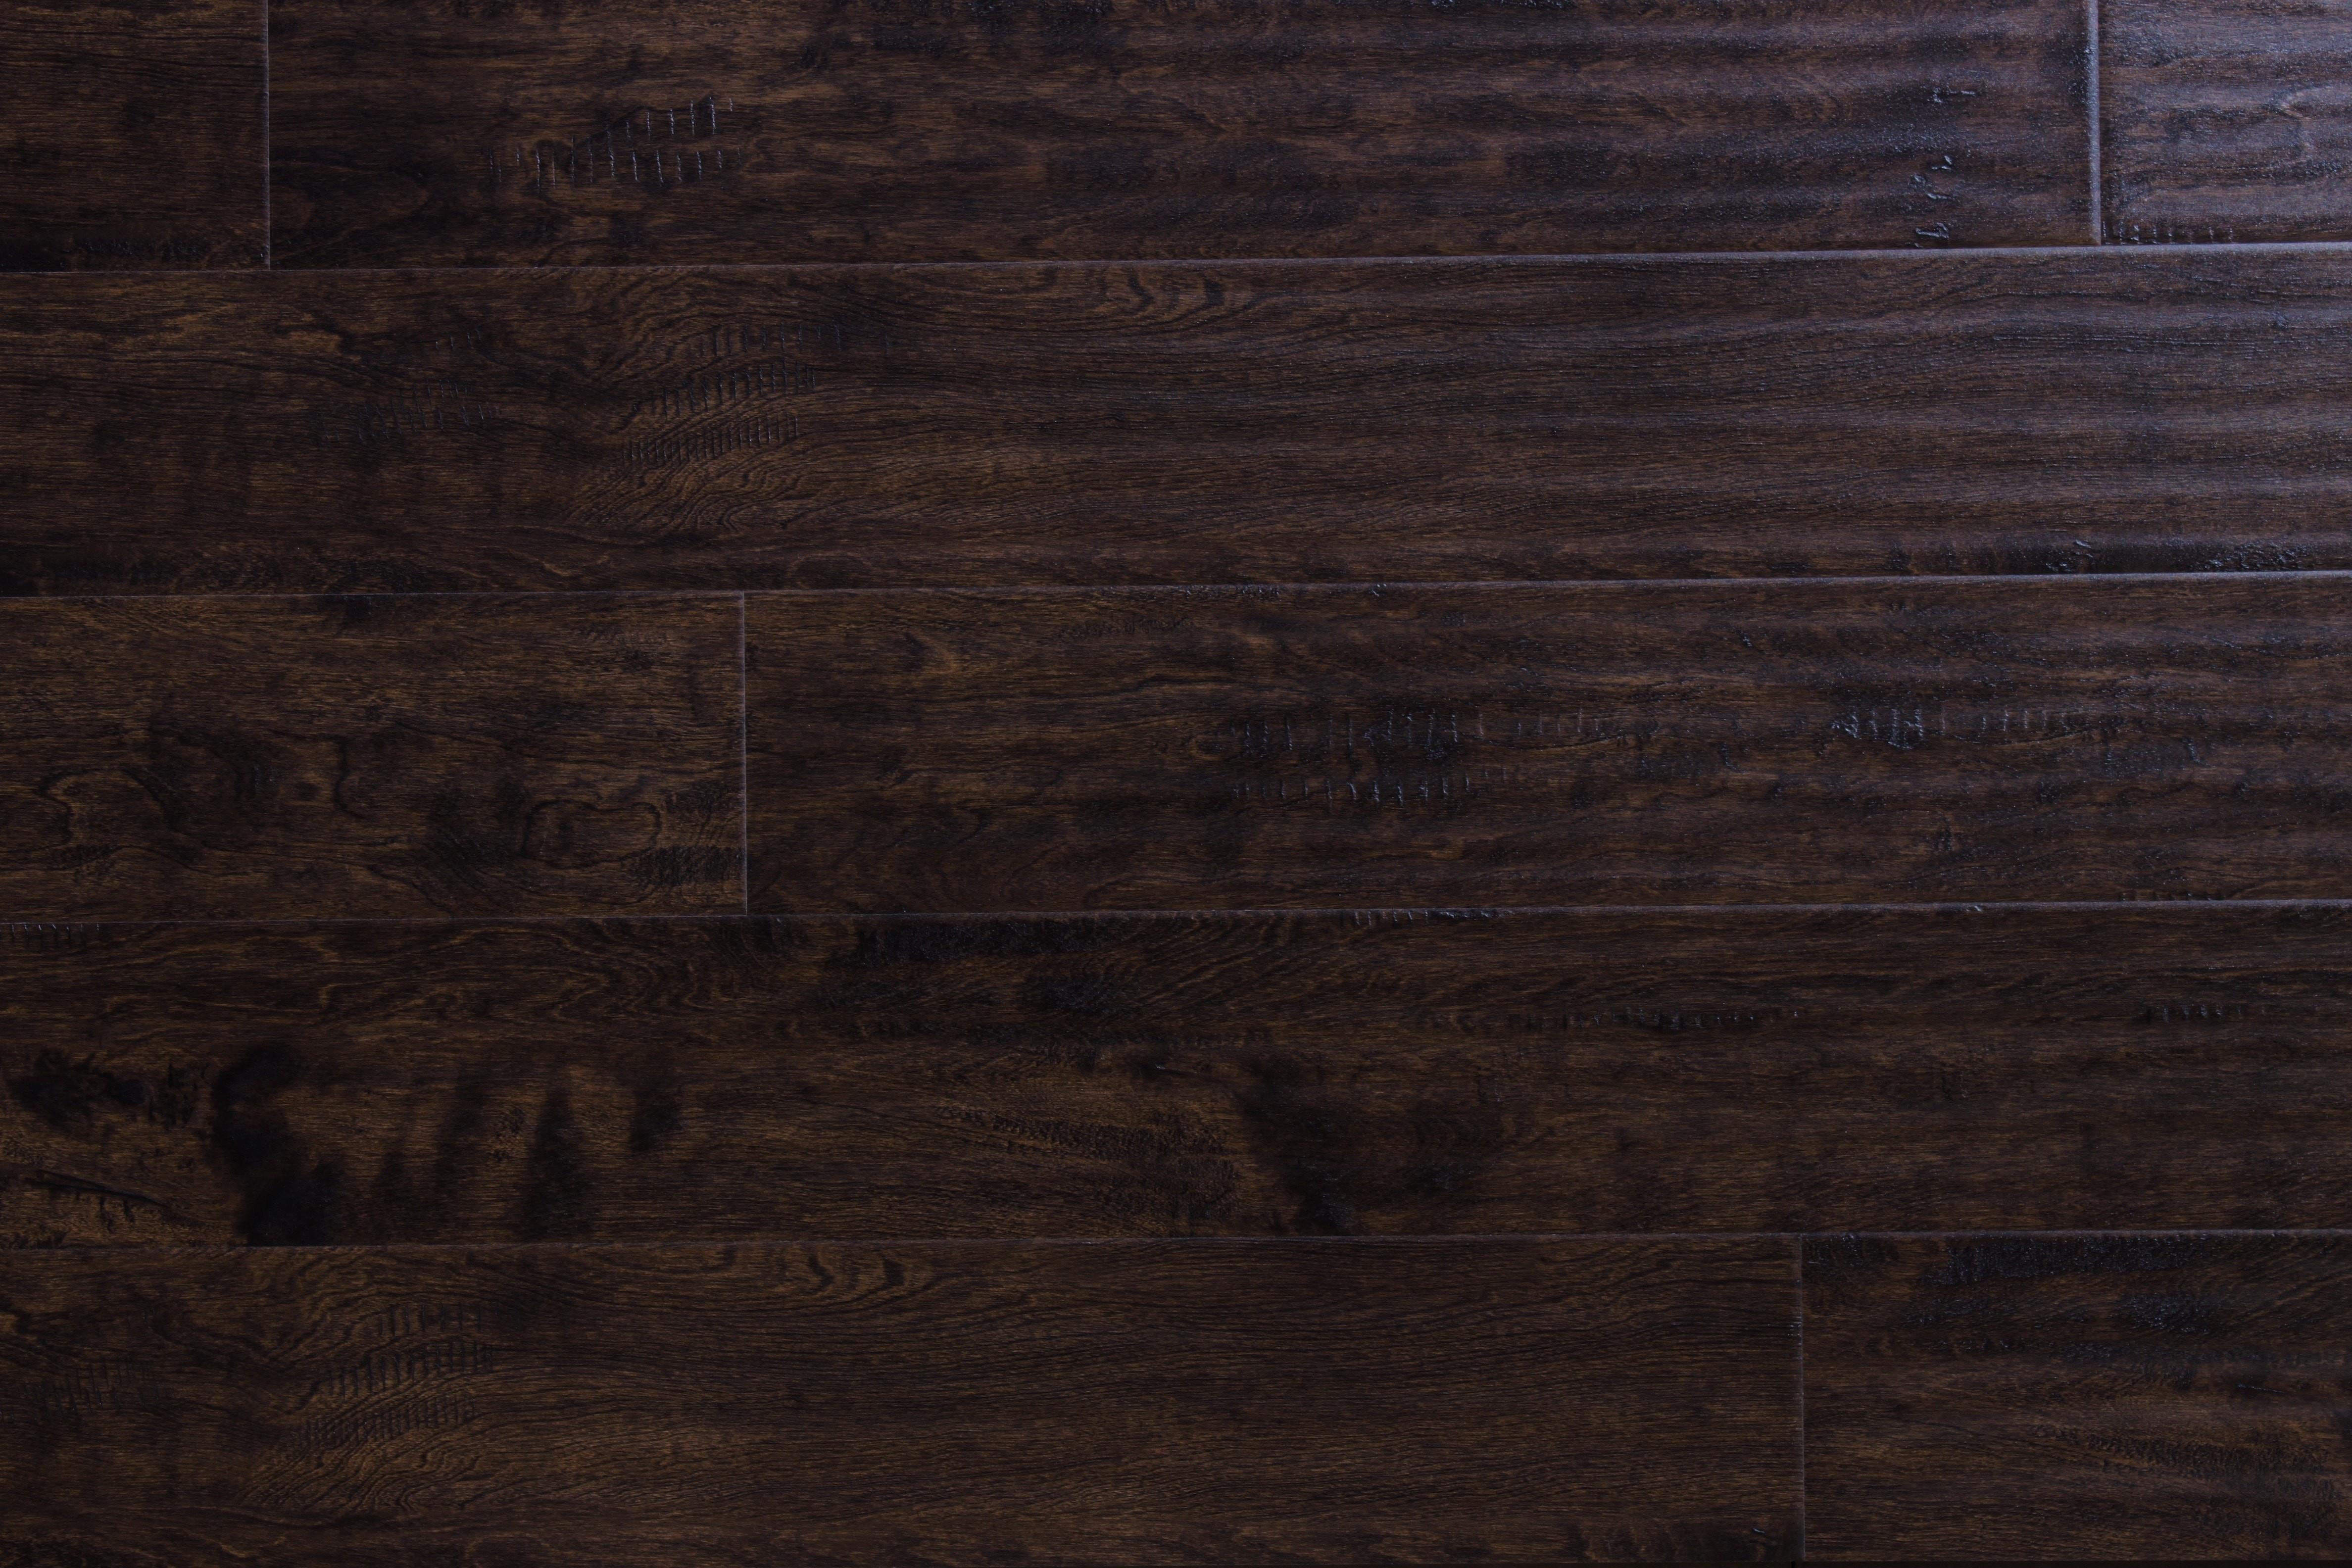 hardwood flooring kalispell of wood flooring free samples available at builddirecta within tailor multi gb 5874277bb8d3c